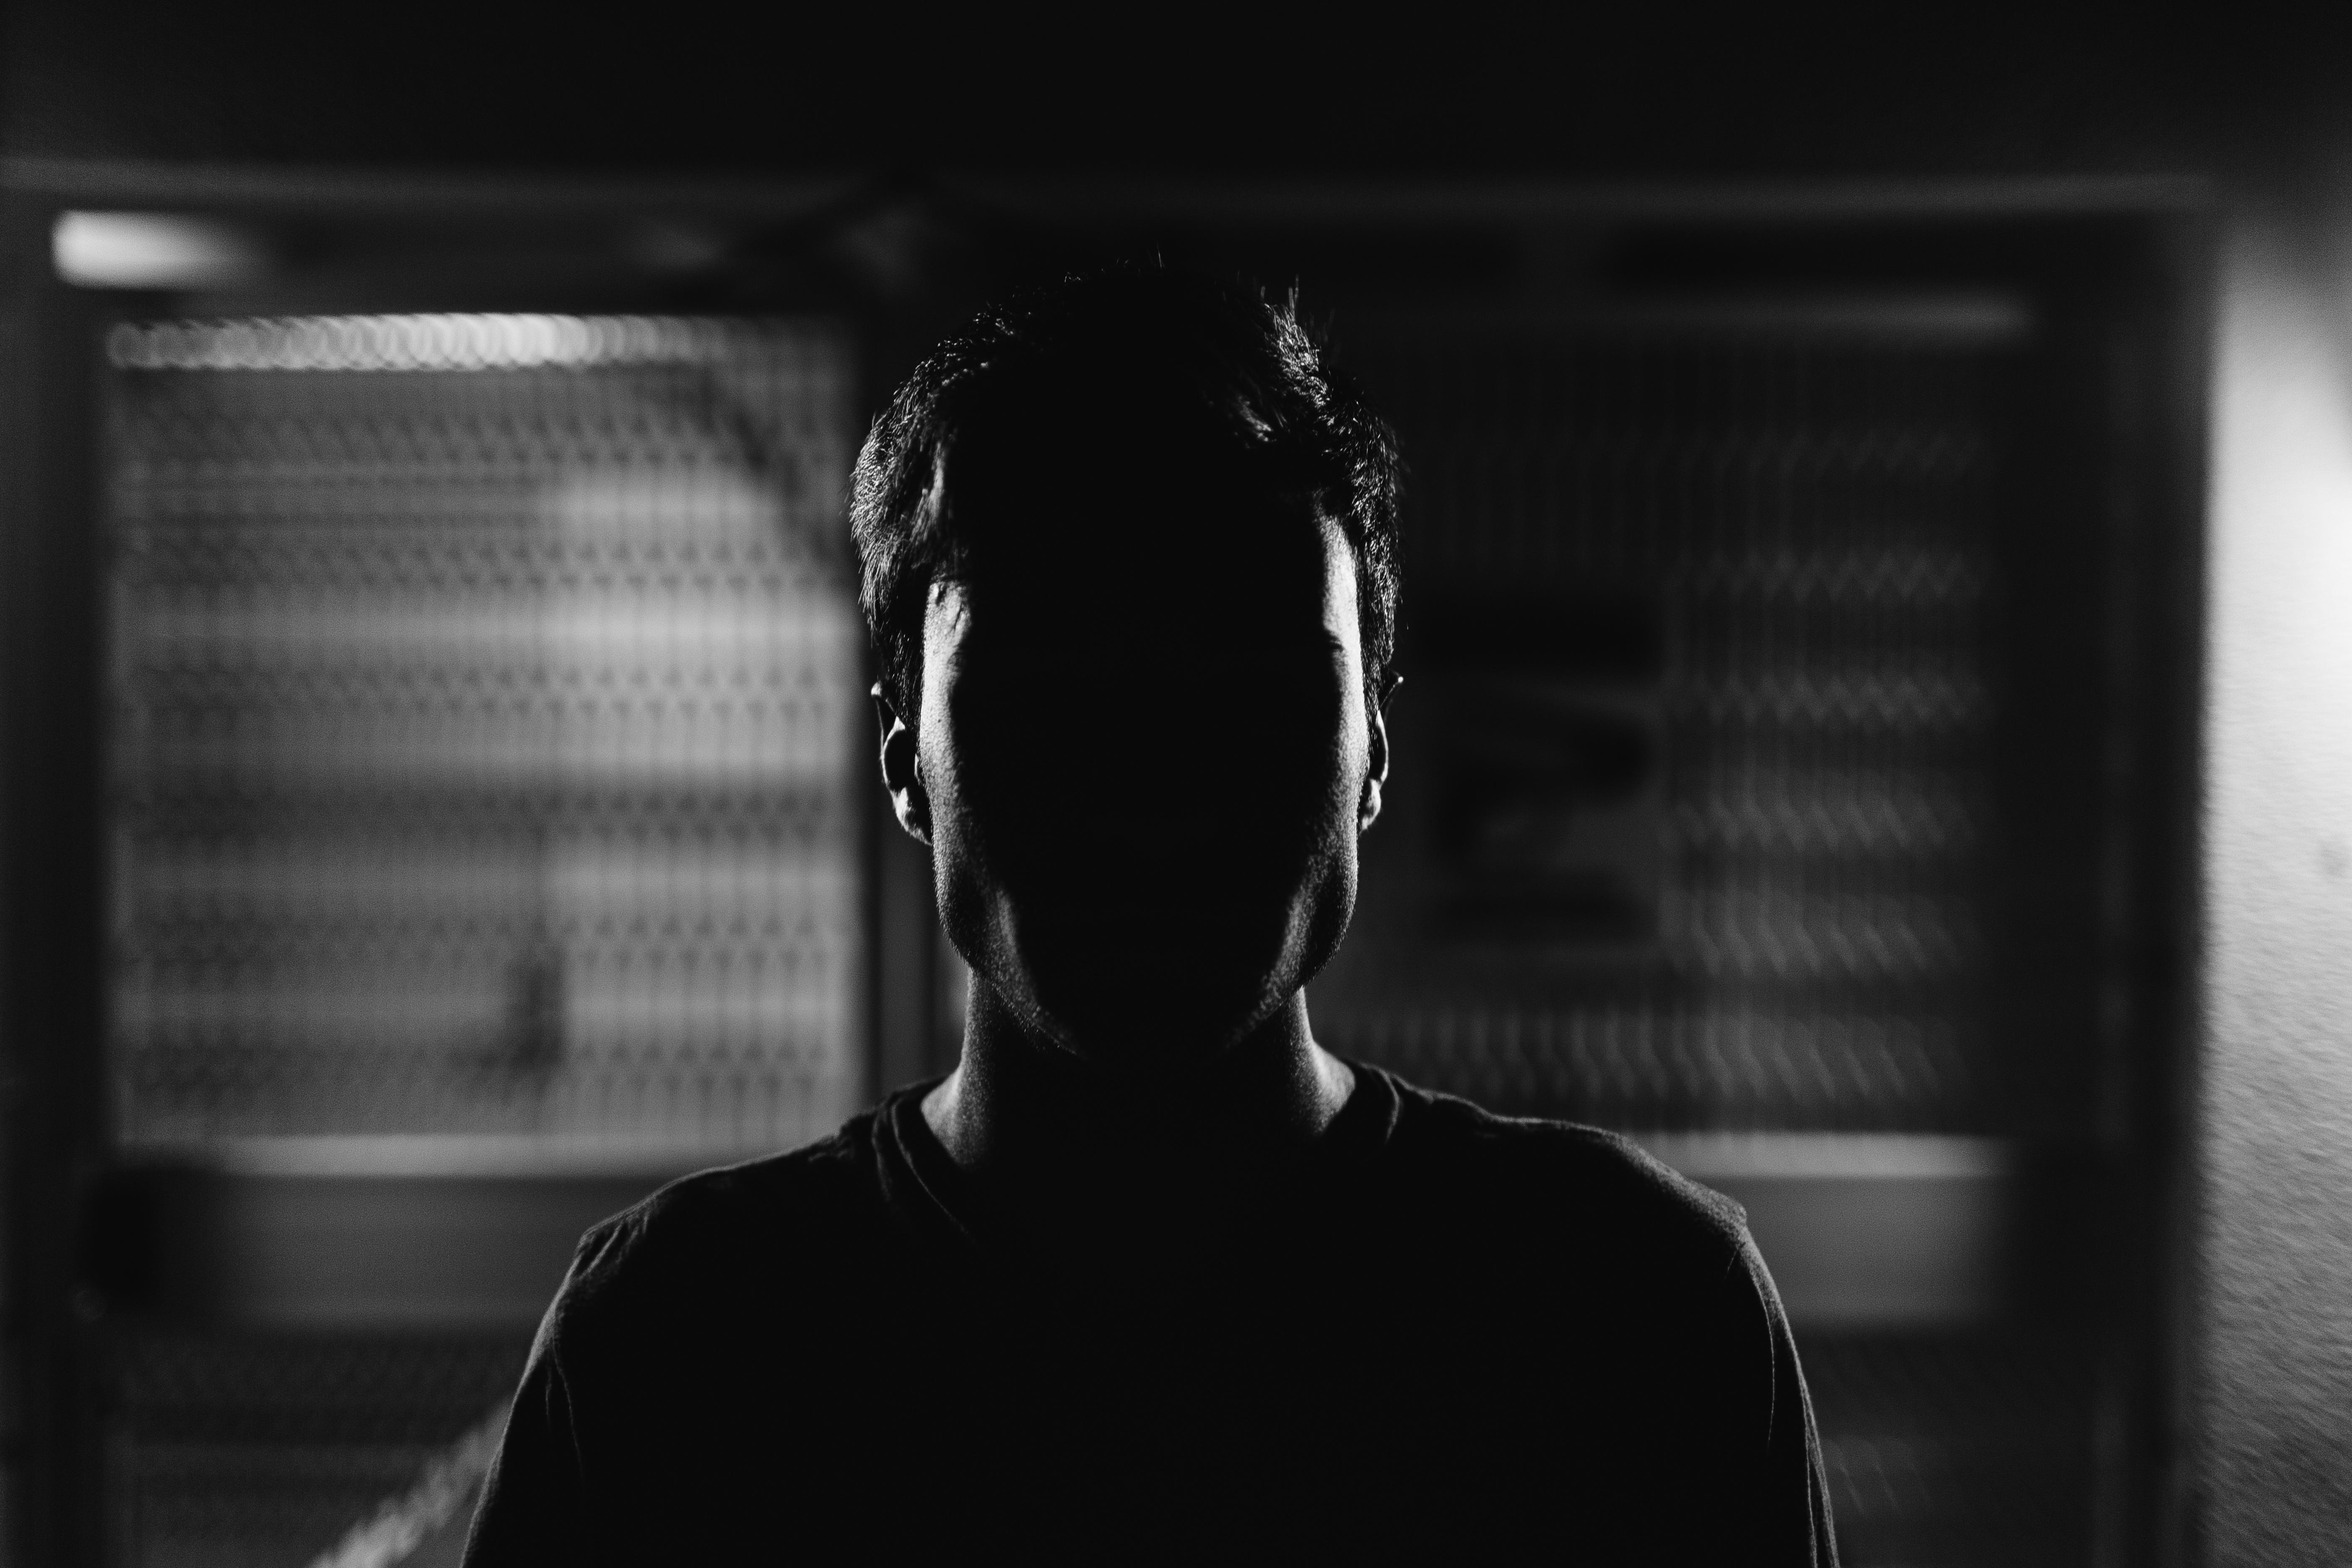 мужчина возле картинки про лица в тени такая жизнь судьба